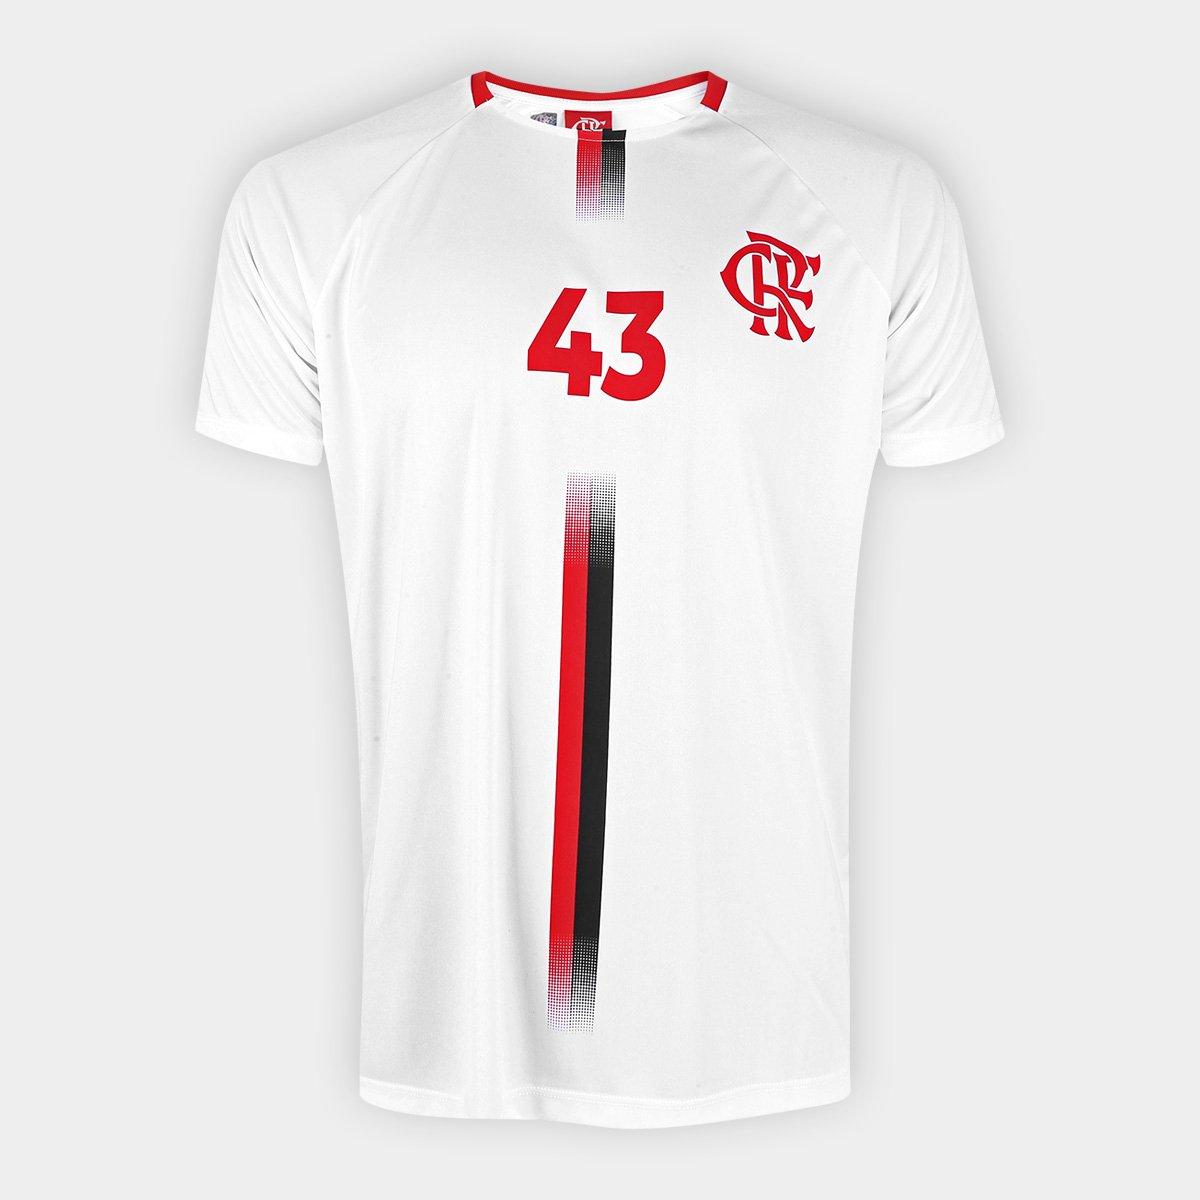 Camisa Flamengo Pet n°43 Exclusiva Masculina